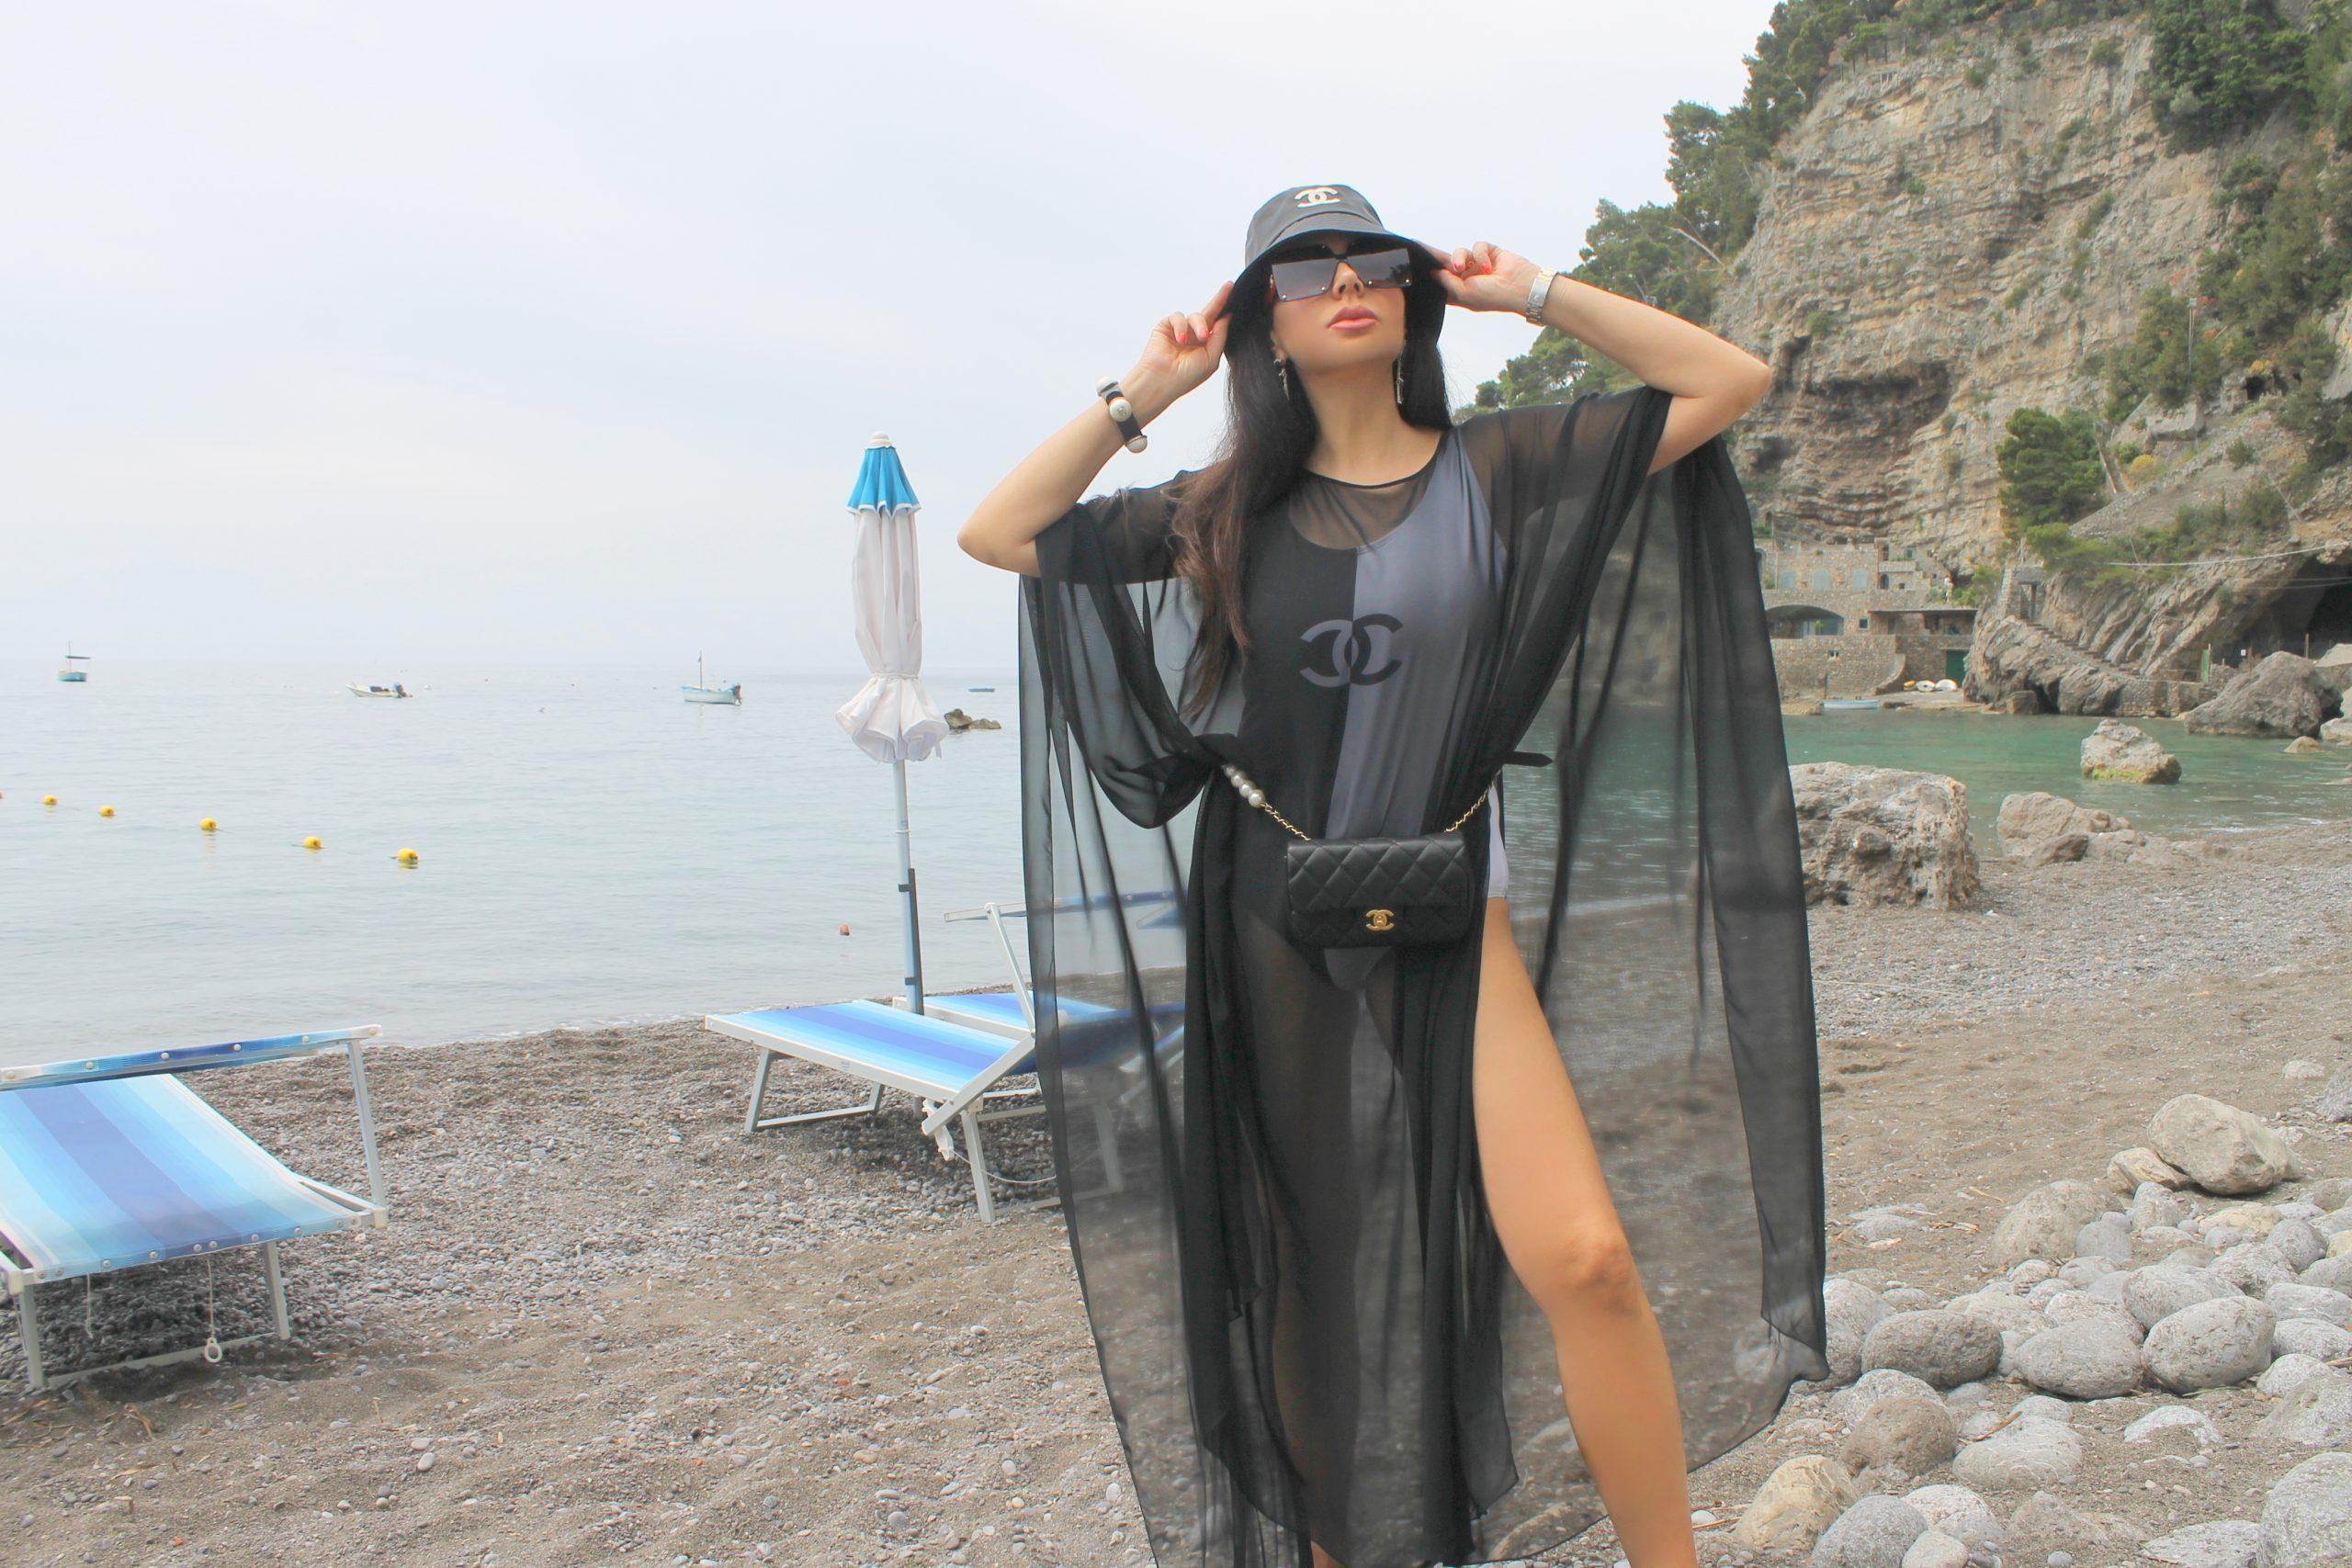 Positano Amalfi Coast Vacation Italian Holiday Inspo Aesthetic Chanel Total Look Black and White Paola Lauretano